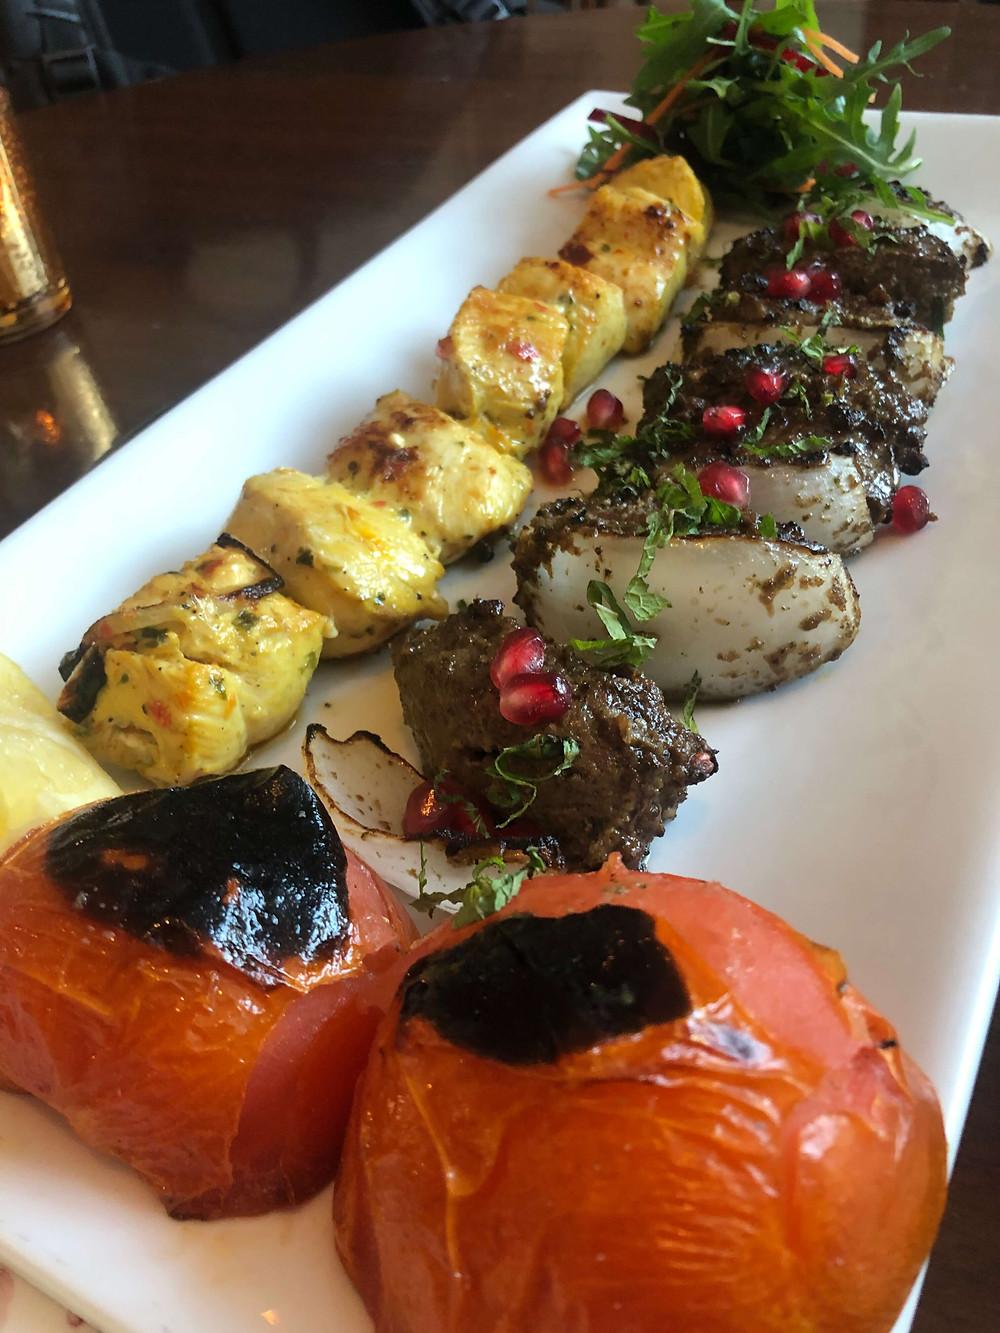 Joojeh and kebab torsh at Kateh Restaurant in Little Venice